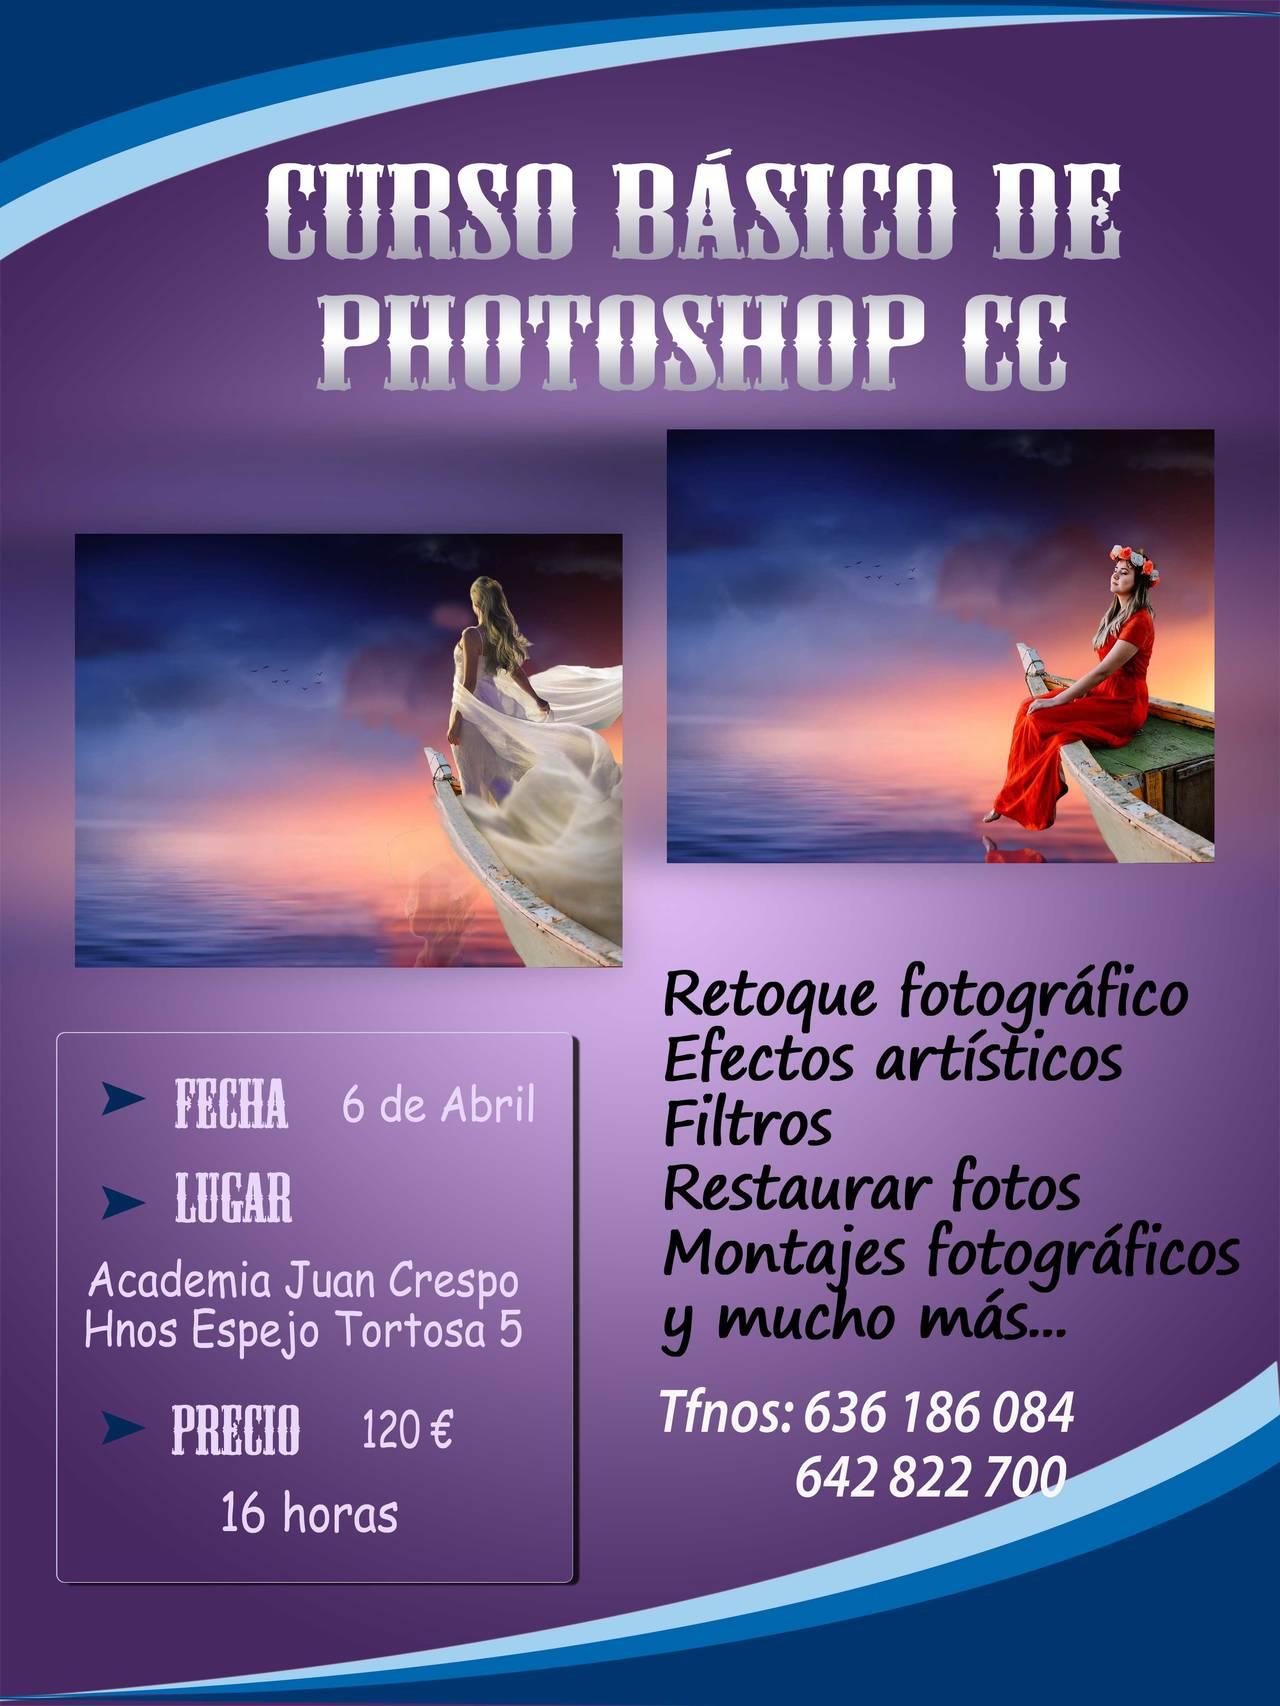 Curso básico de Photoshop CC